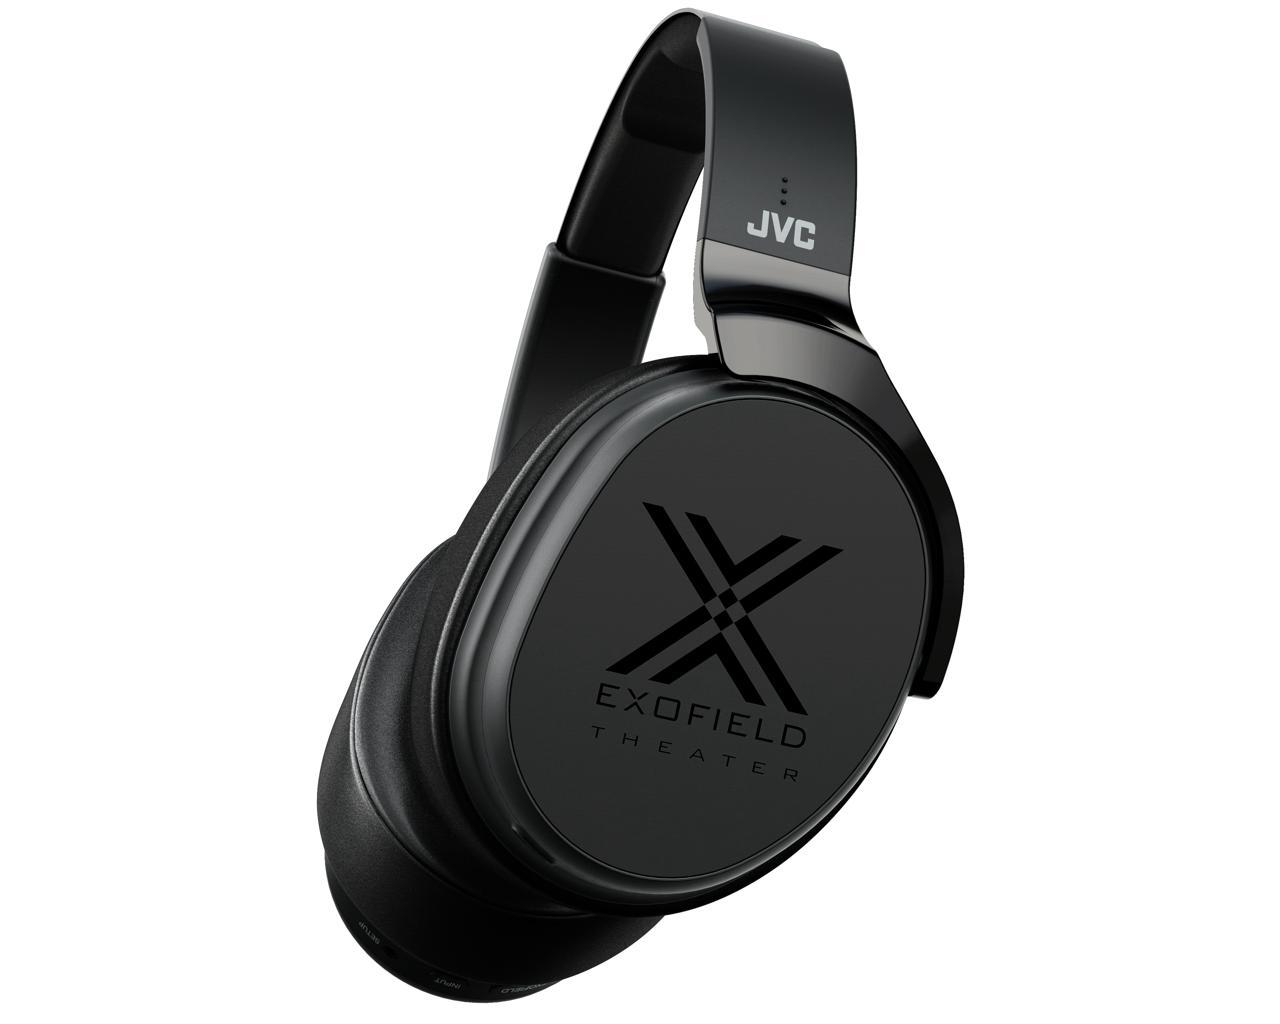 banc d'essai JVC EXOFIELD XP-EXT1